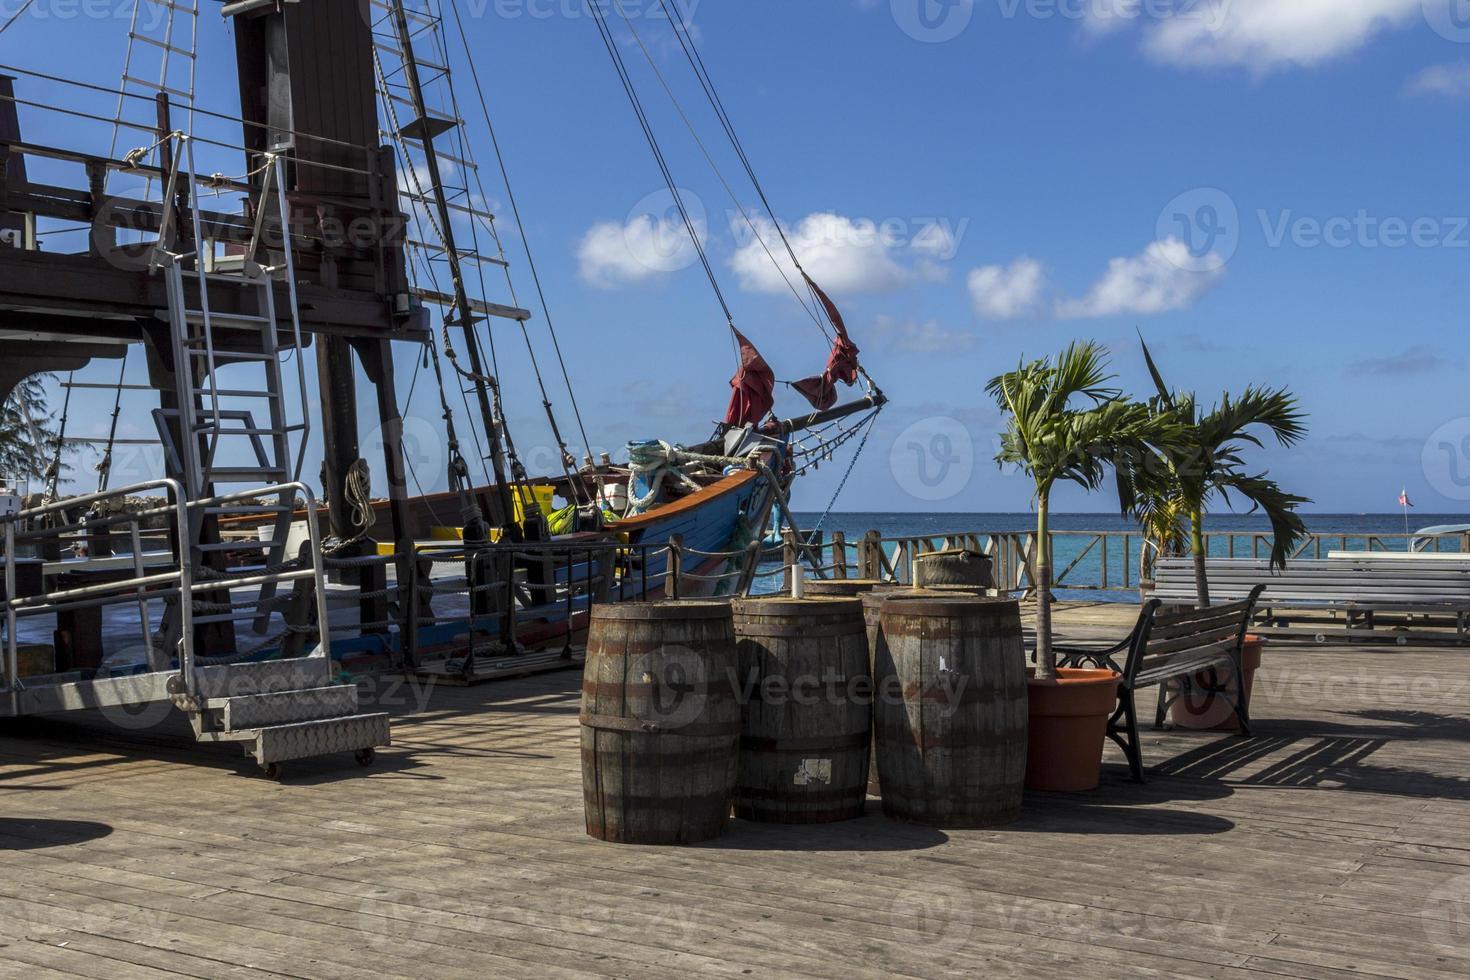 bateau pirate commercial photo